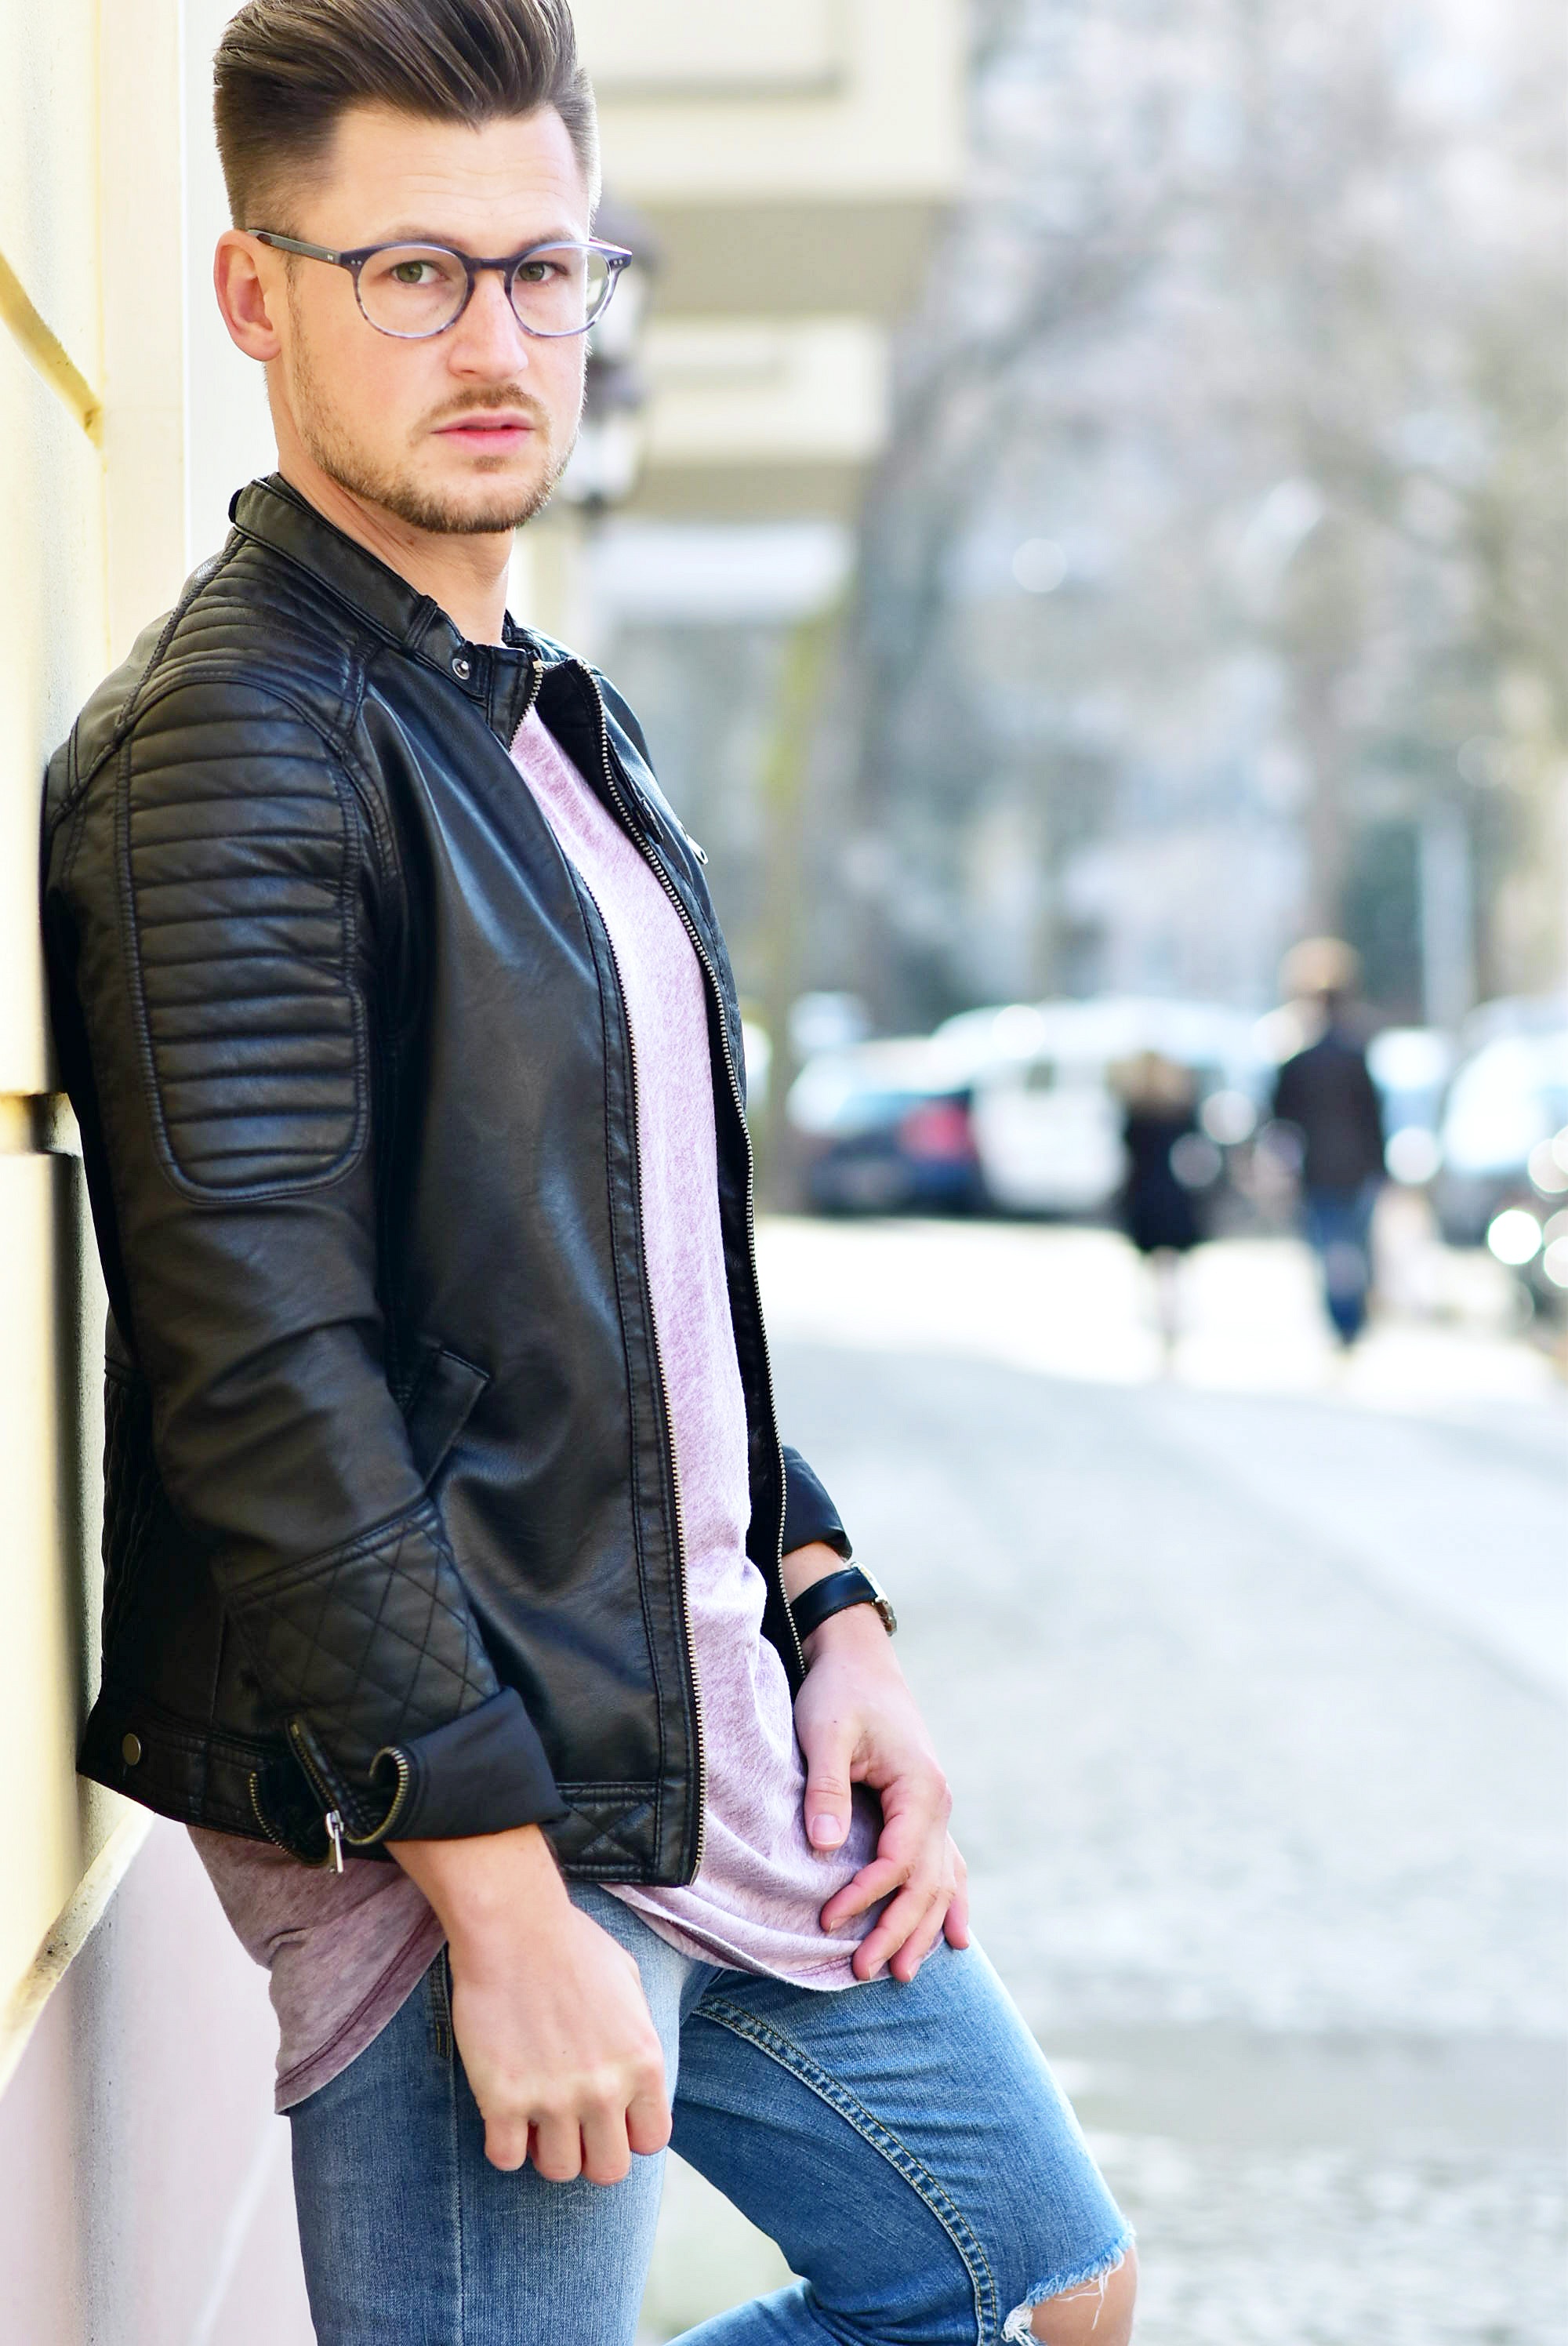 Tommeezjerry-Styleblog-Männerblog-Modeblog-Berlin-Outfit-Casual-Streetlook-Ripped-Jeans-Lederjacke-Bikerjacke-Weiße-Sneaker